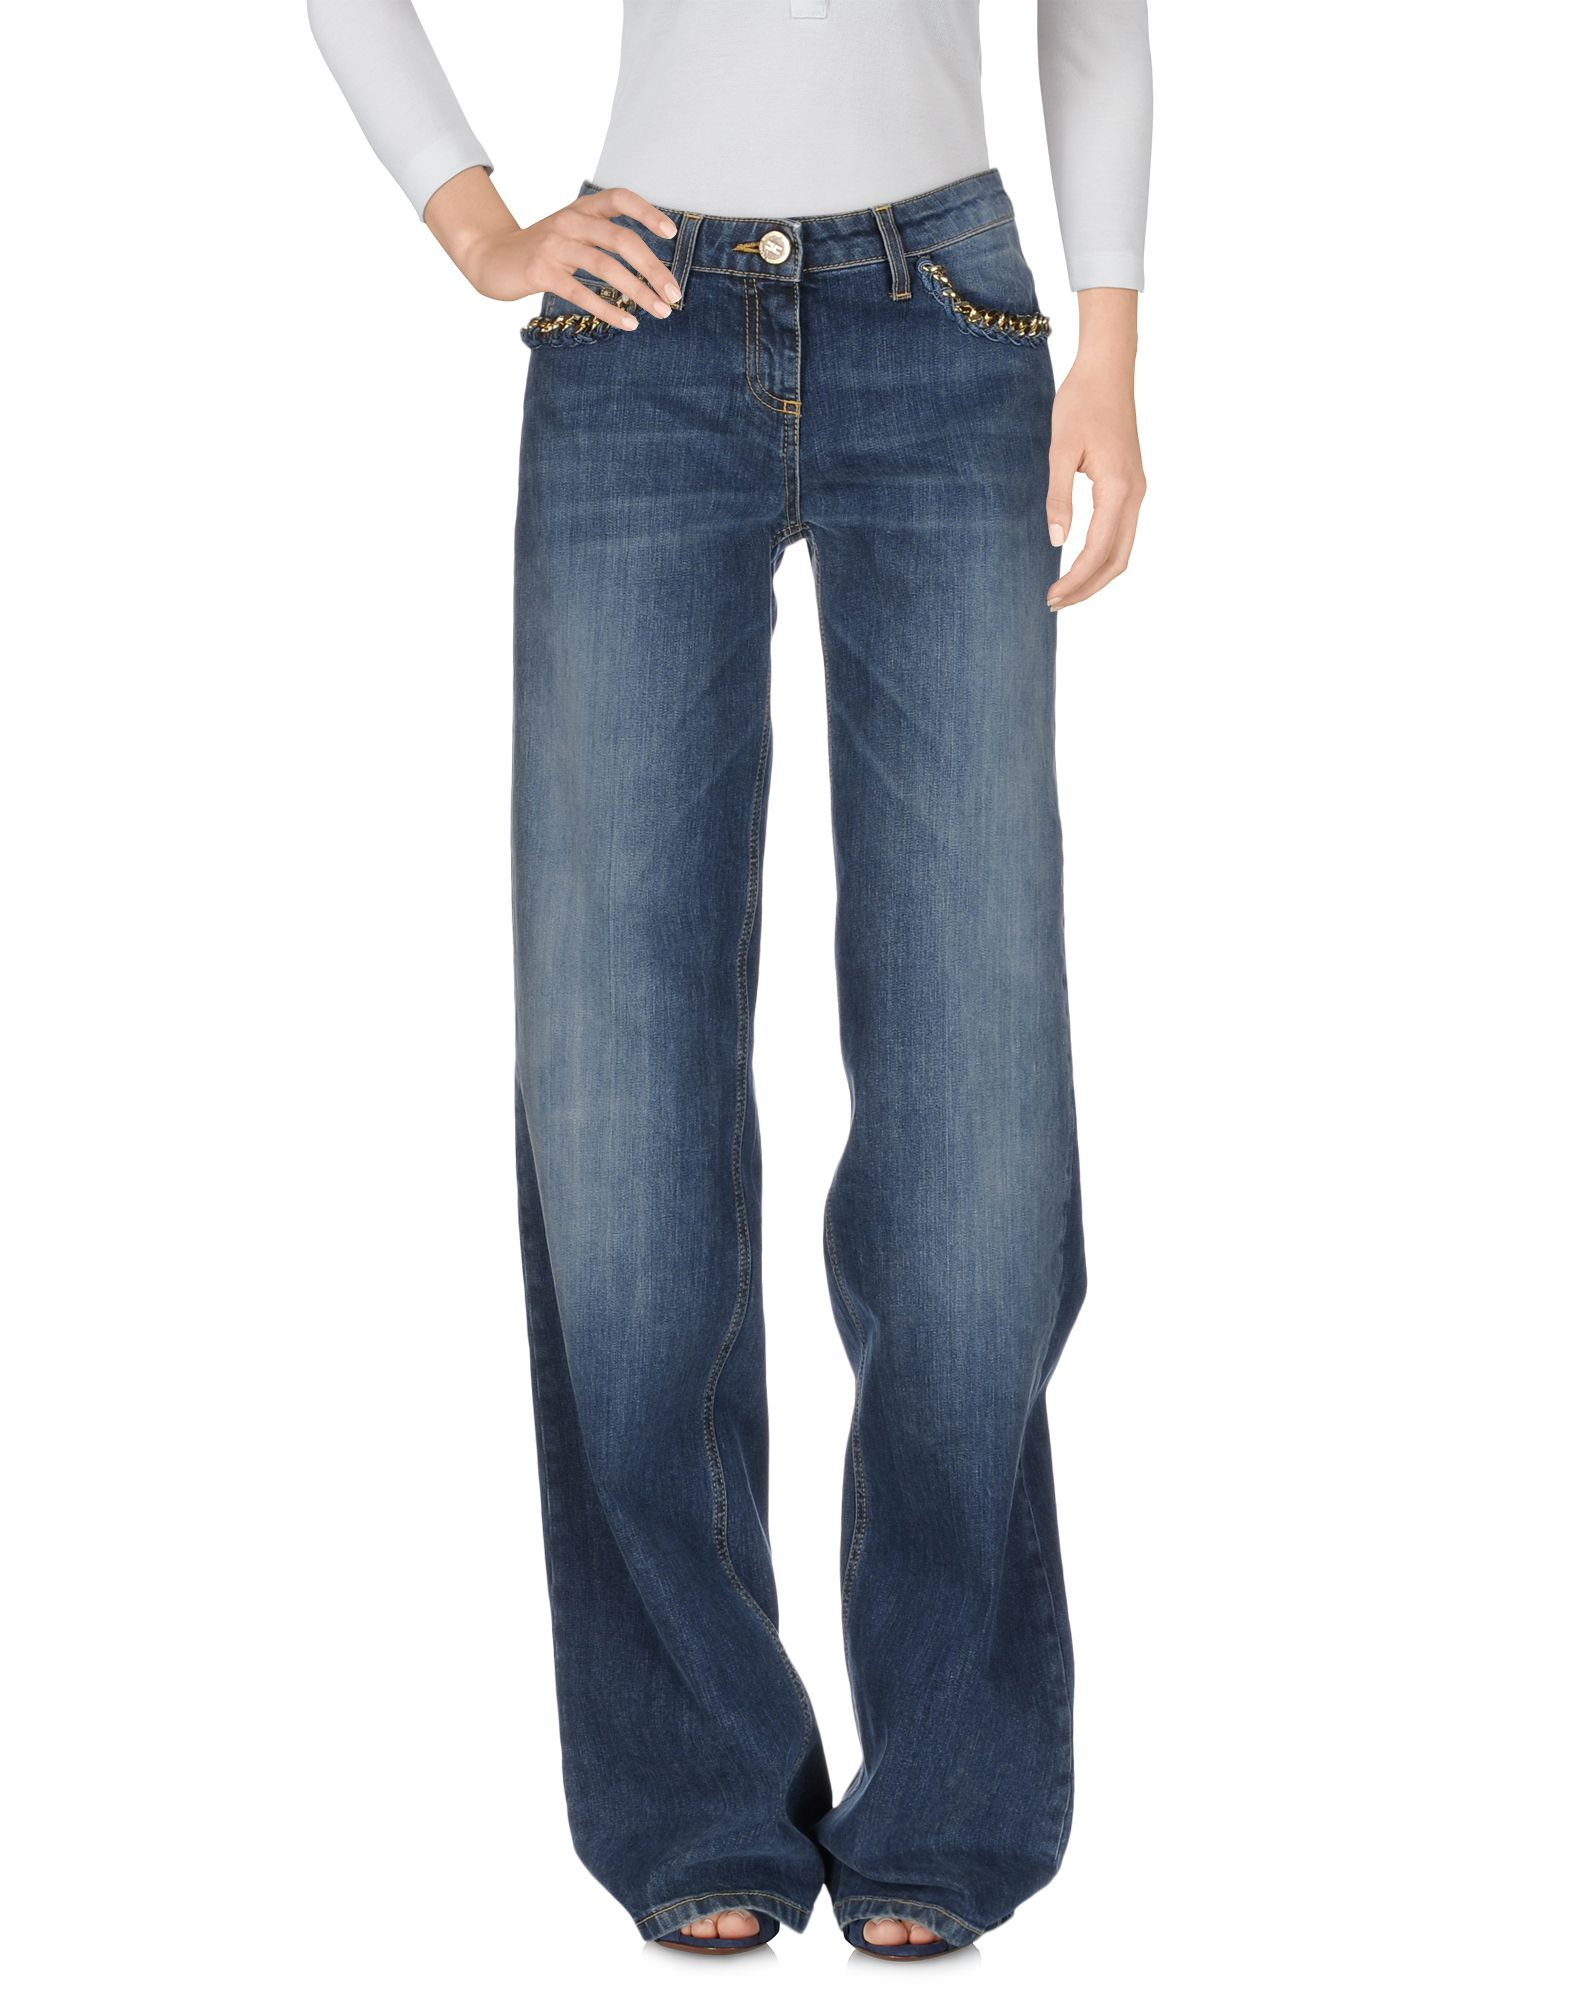 ELISABETTA FRANCHI JEANS Джинсовые брюки elisabetta franchi рубашка от elisabetta franchi 55248